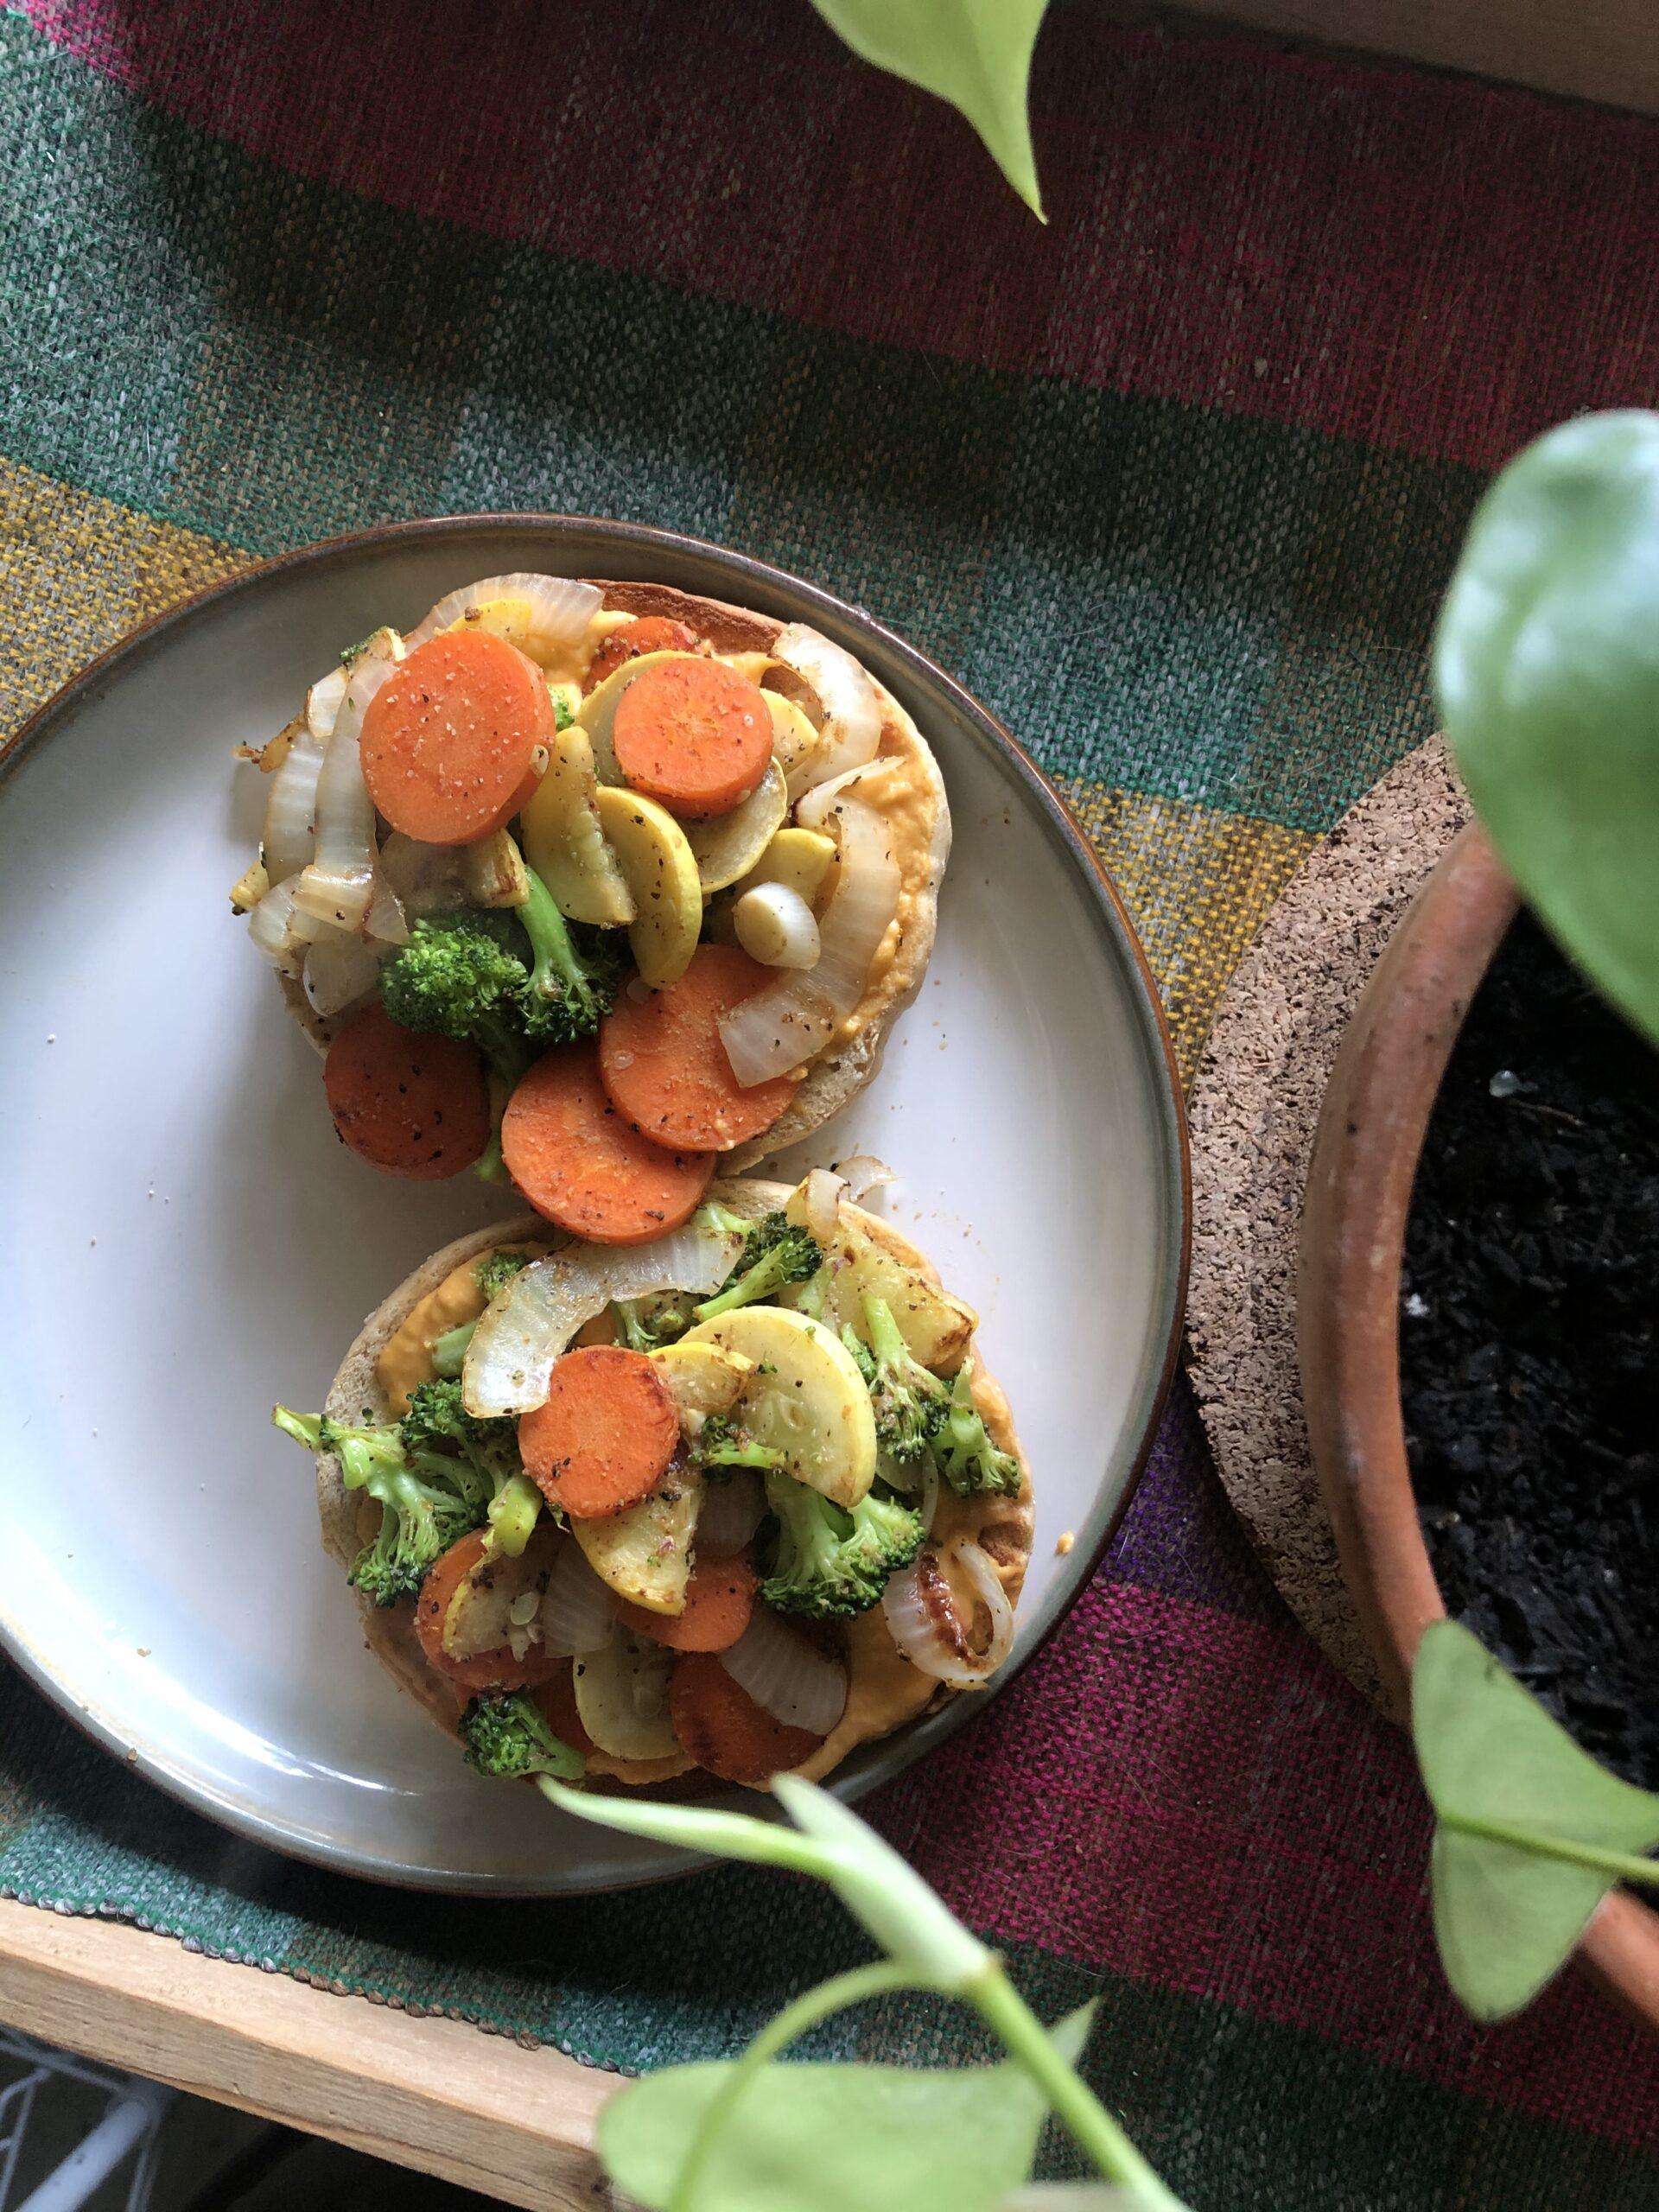 Hummus & Veggie Breakfast Bagel